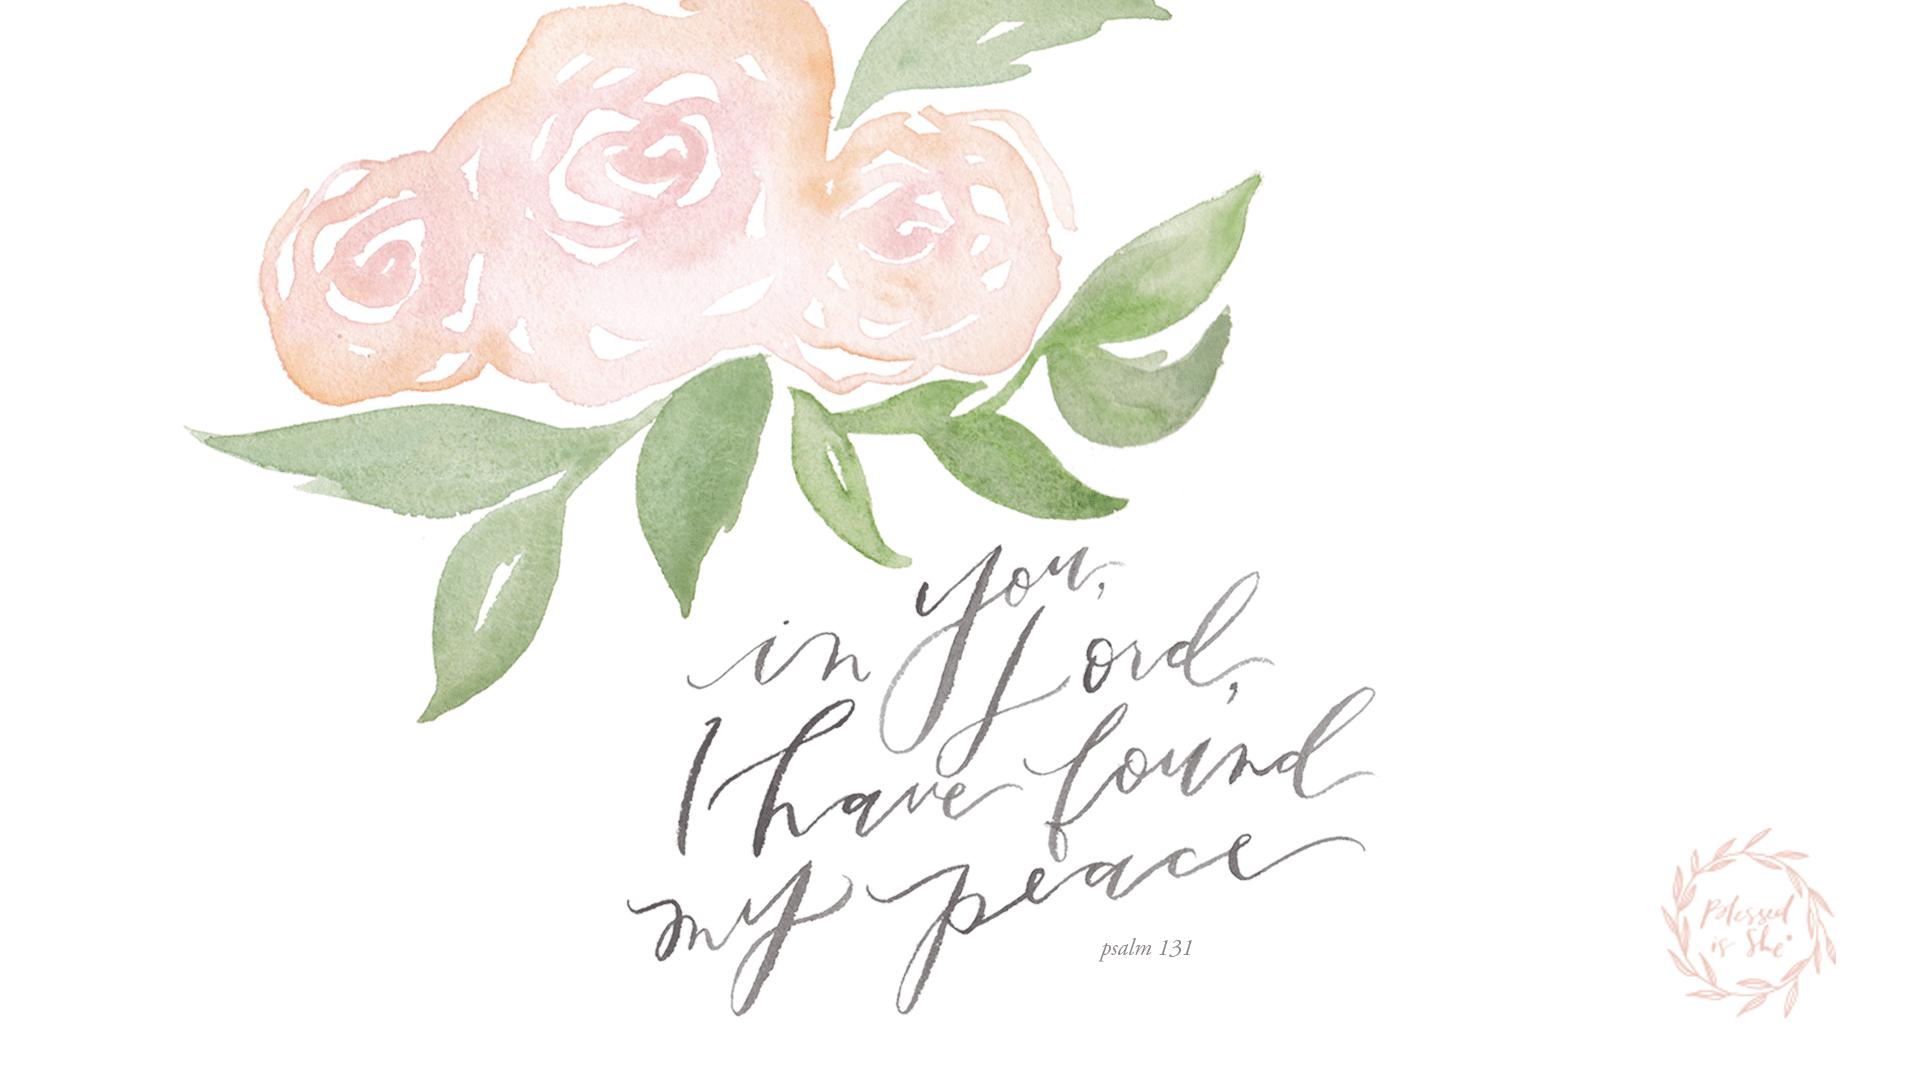 Bible Verses Desktop Wallpaper Posted By Sarah Peltier